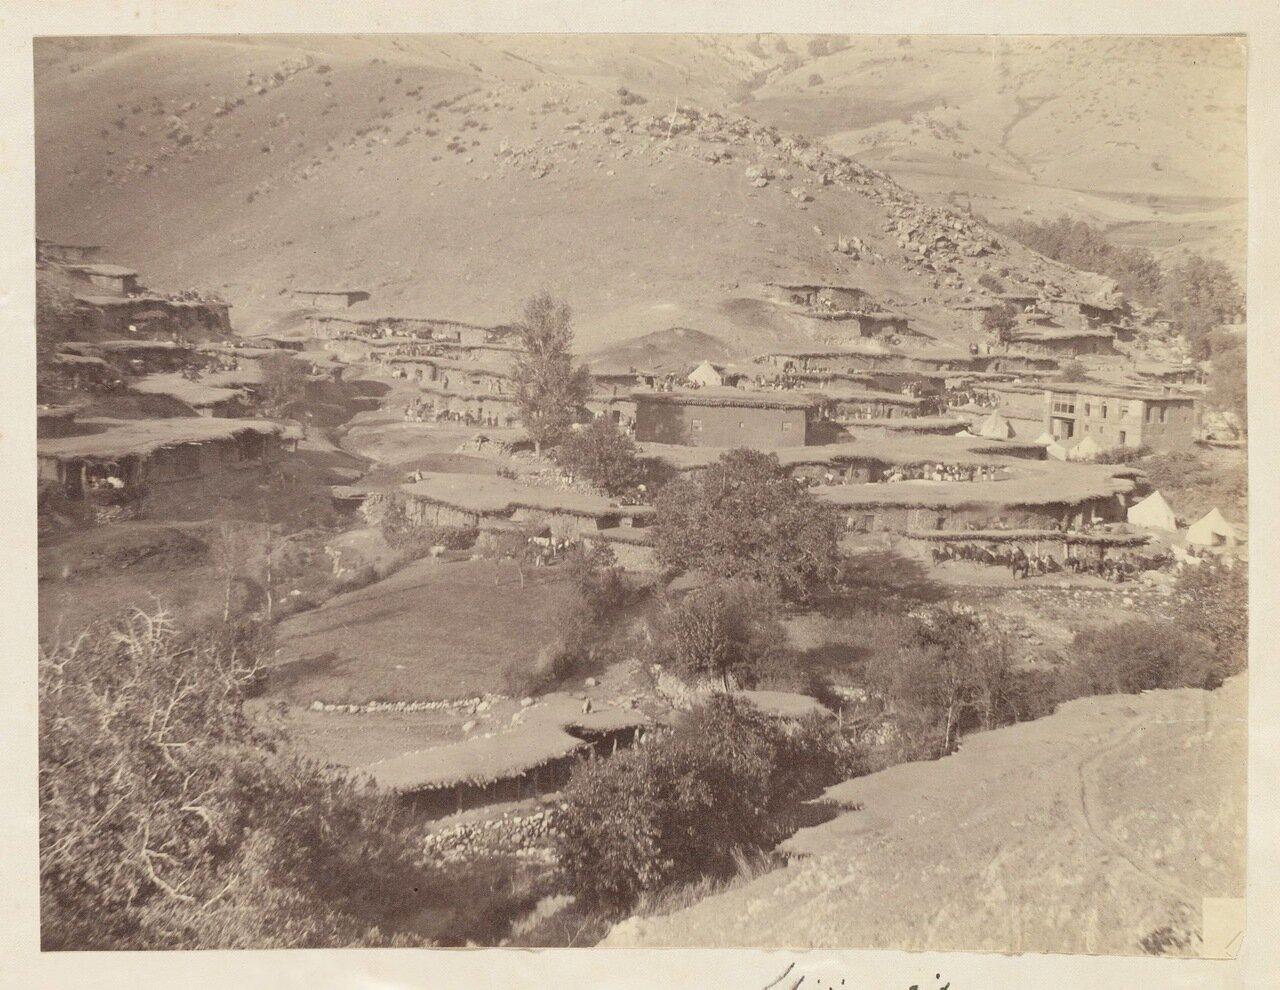 Деревня в Западном Азербайджане